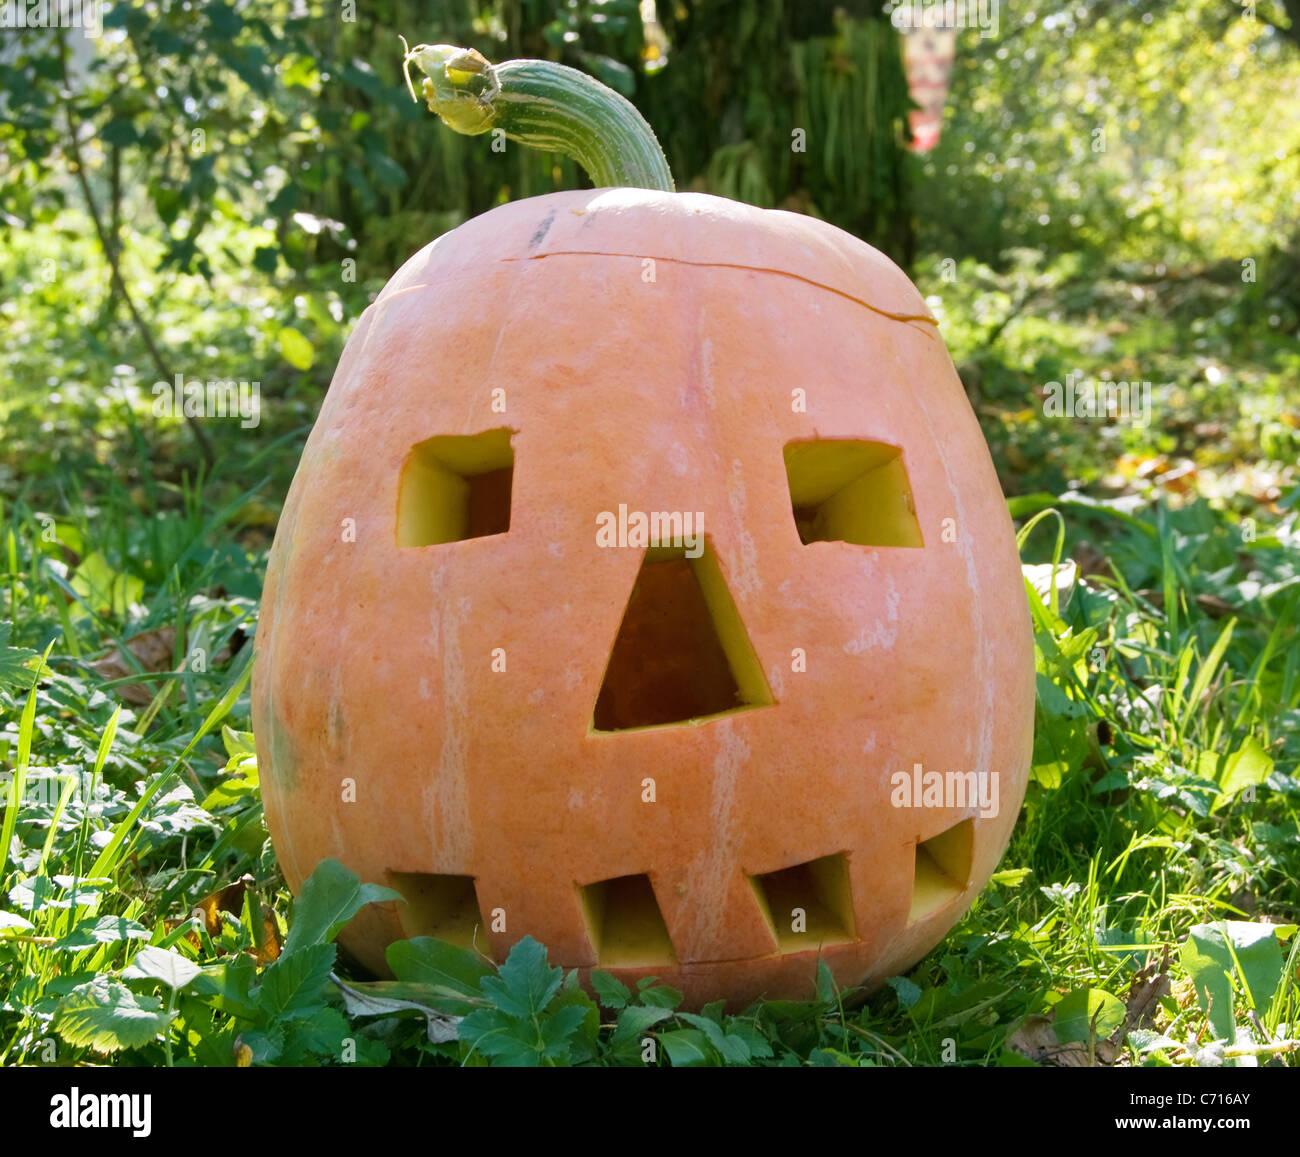 halloween pumpkin on greenery to the grass - Stock Image